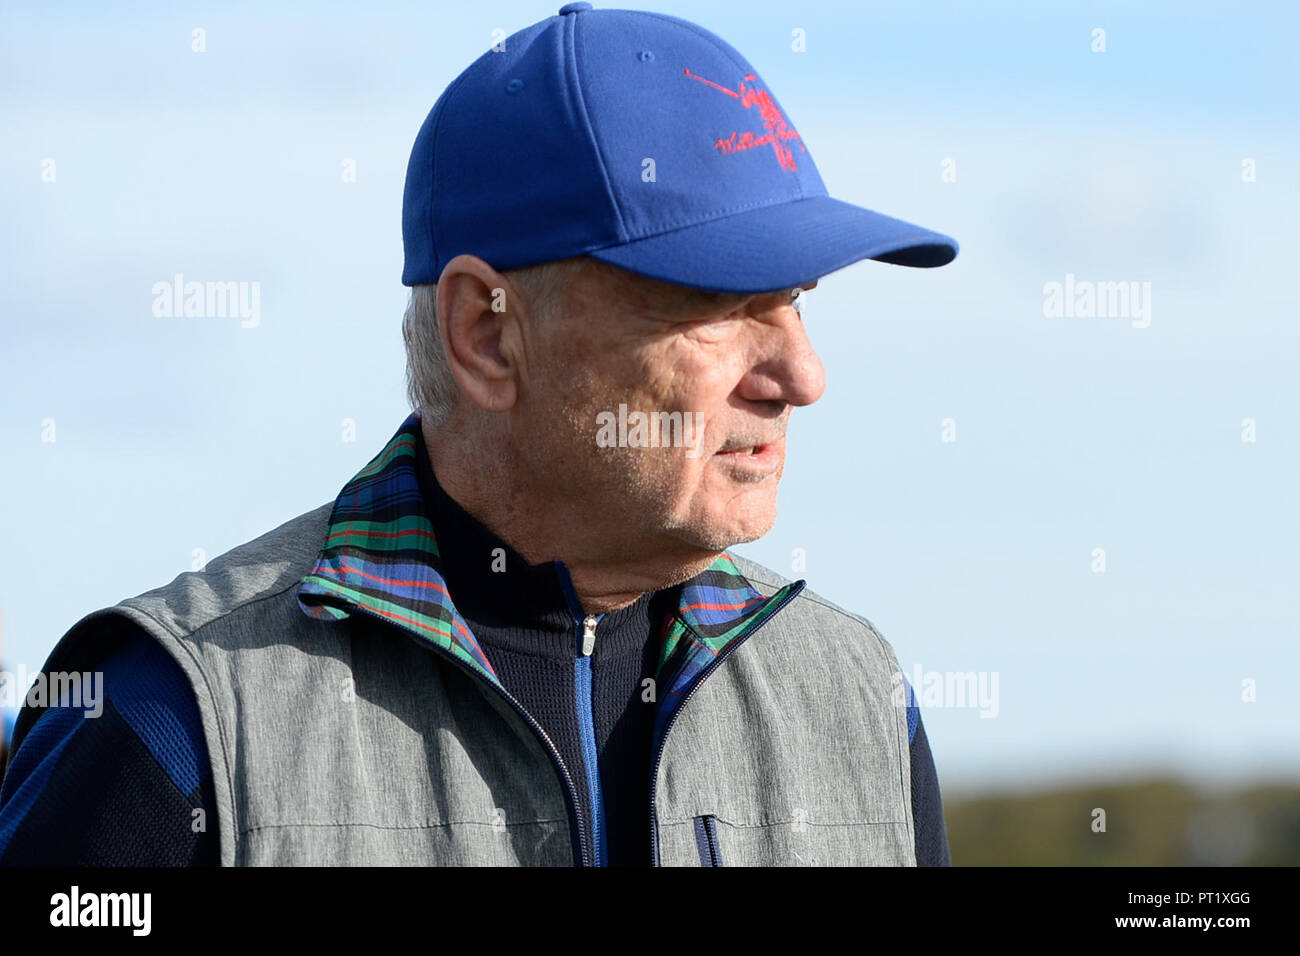 Kingsbarns, Scotland, United Kingdom, 05, October, 2018. Actor Bill Murray at Kingsbarns Golf Links during the Dunhill Links Championship. © Ken Jack / Alamy Live News - Stock Image